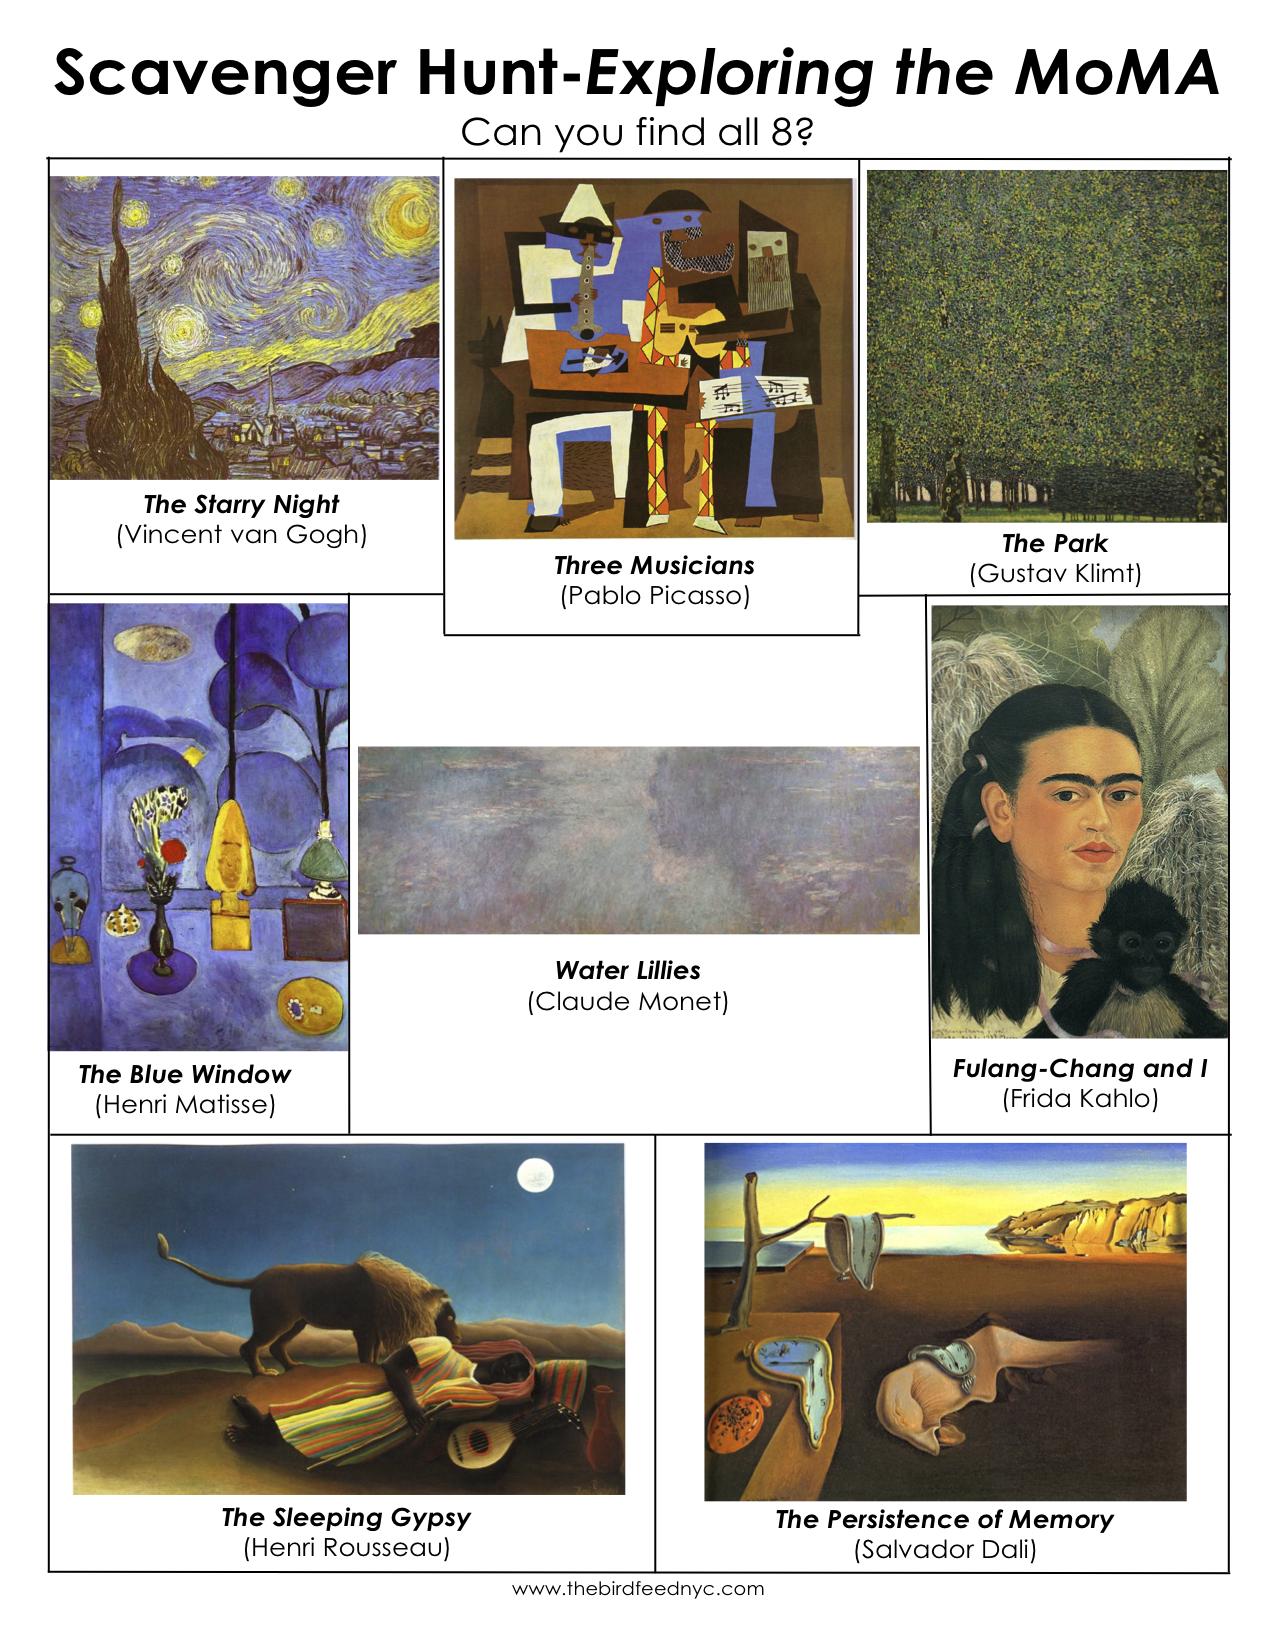 Scavenger Hunt for Kids: Exploring the MoMA